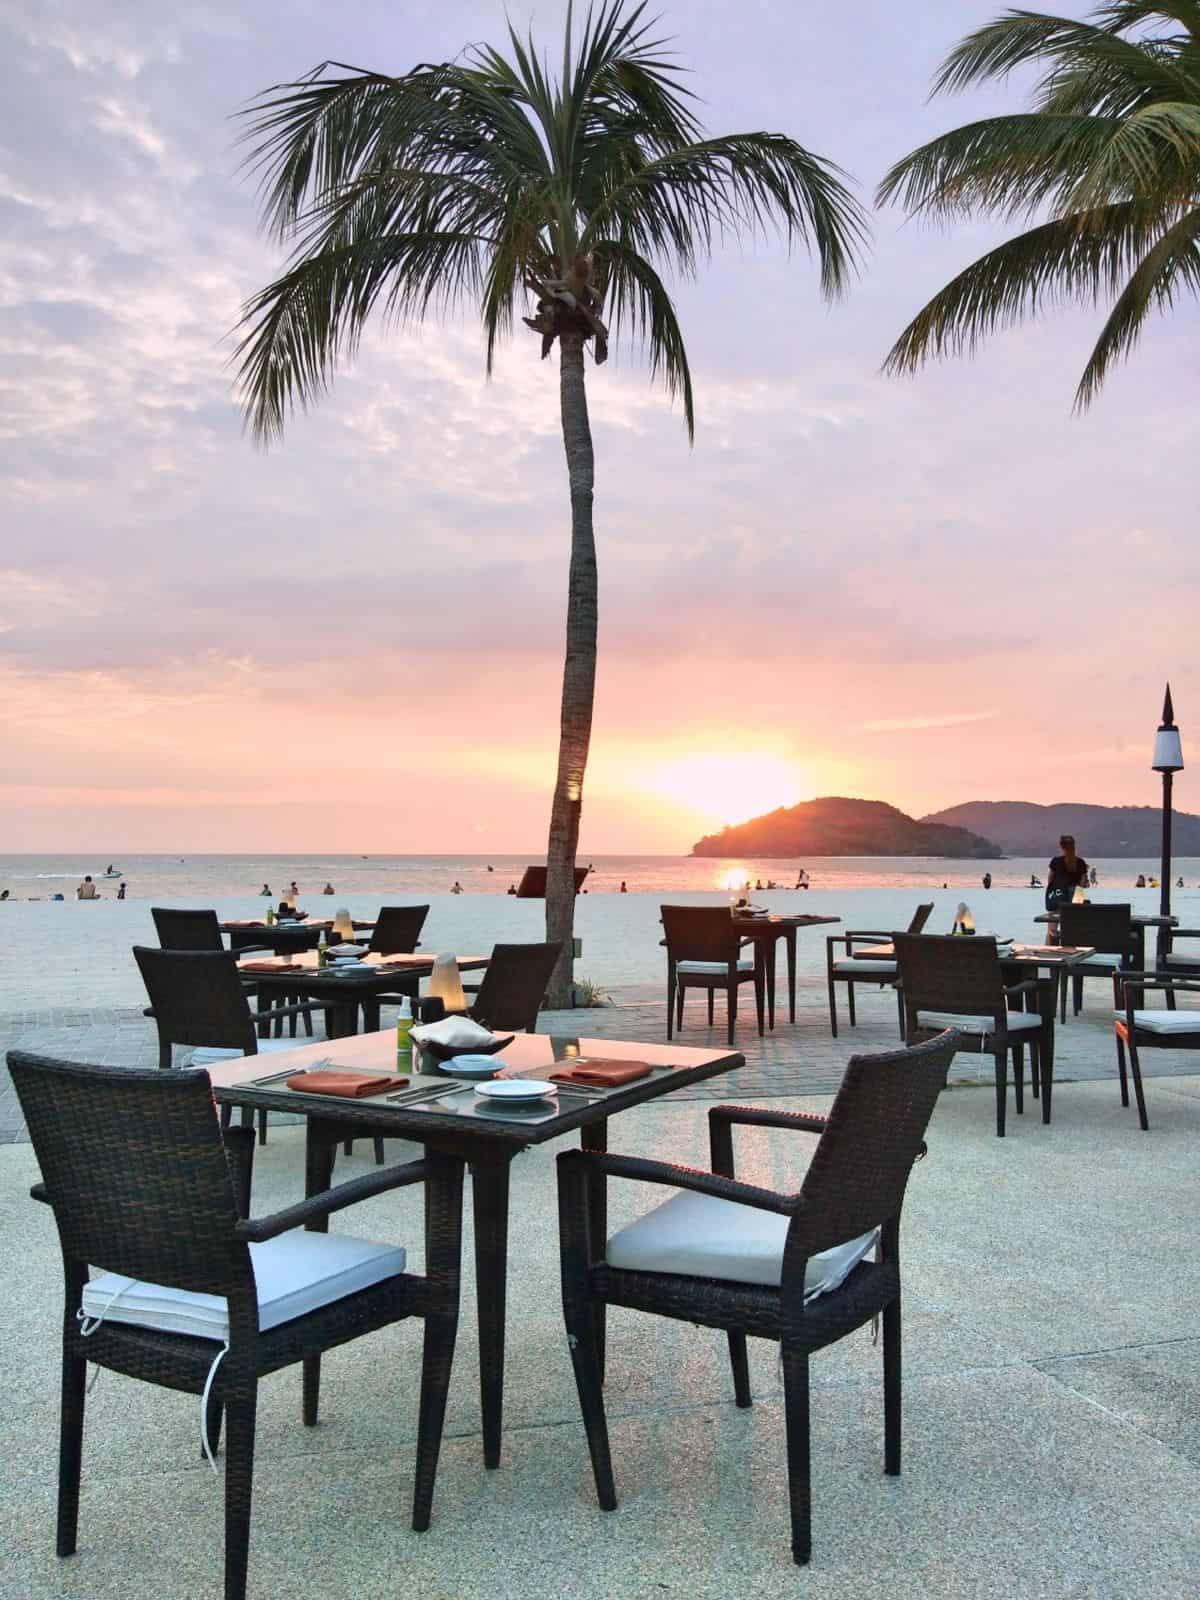 Cenang-Beach-sunset-Langkawi-Malaysia